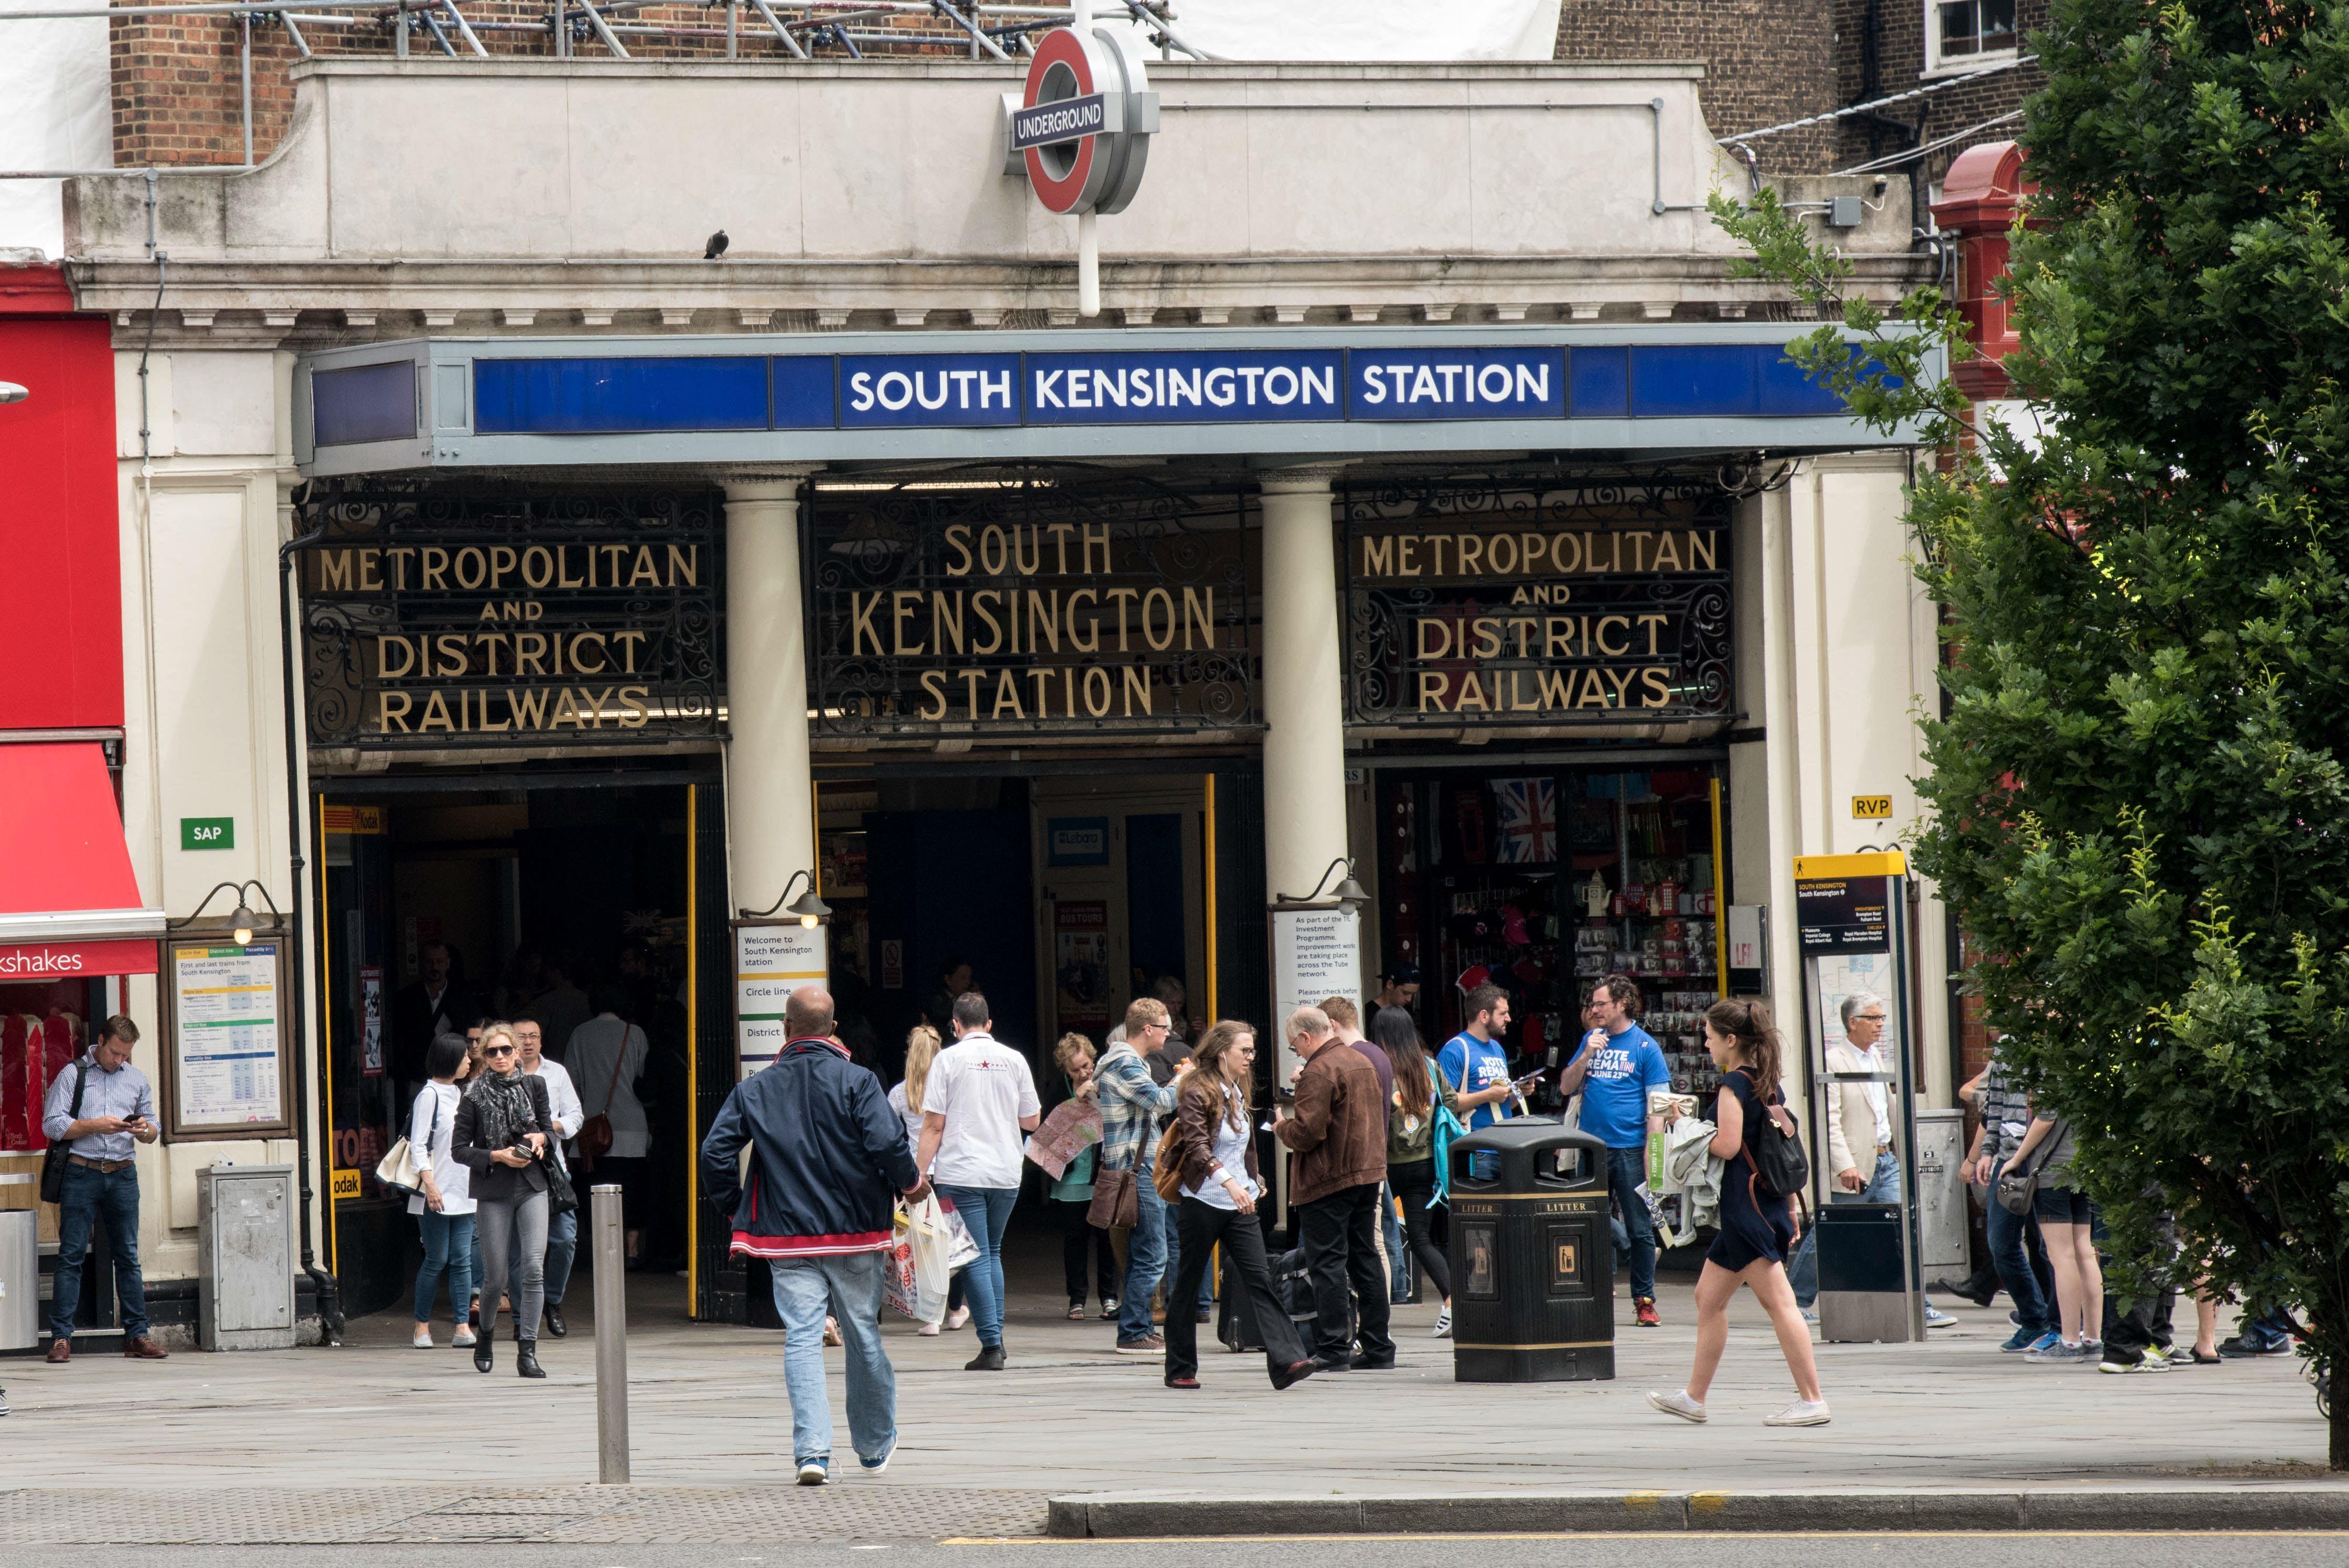 South Kensington station, London, England.